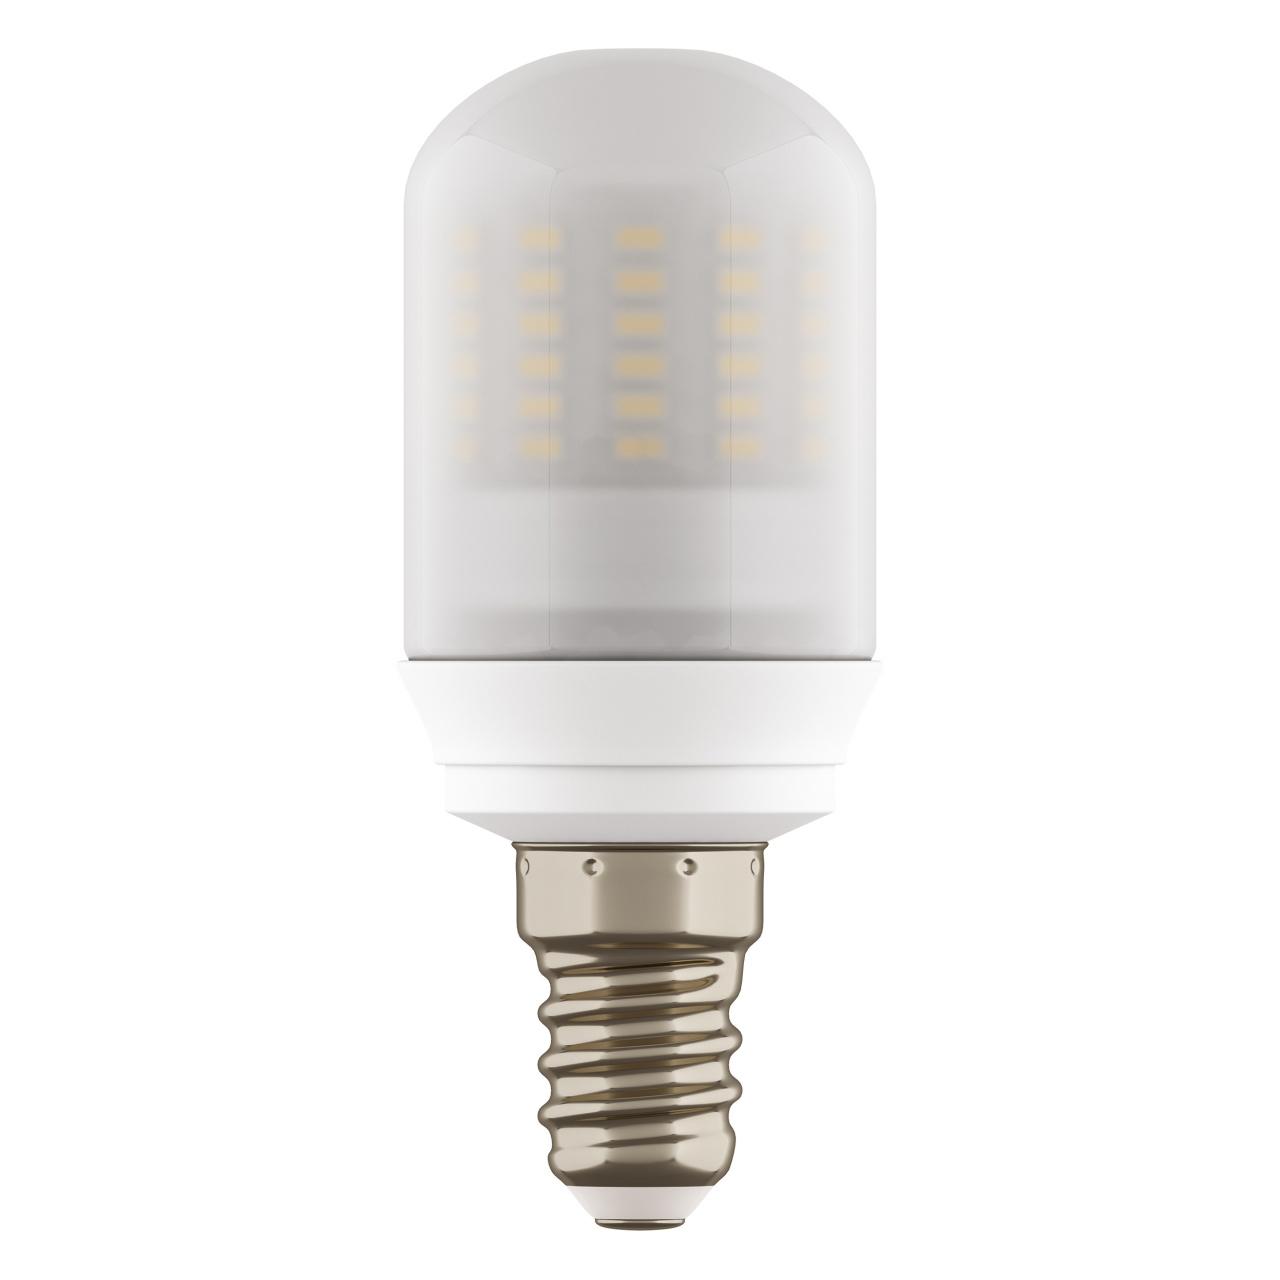 Лампа LED 220V T35 E14 9W=90W 780LM 360G FR 4000K 20000H Lightstar 930714